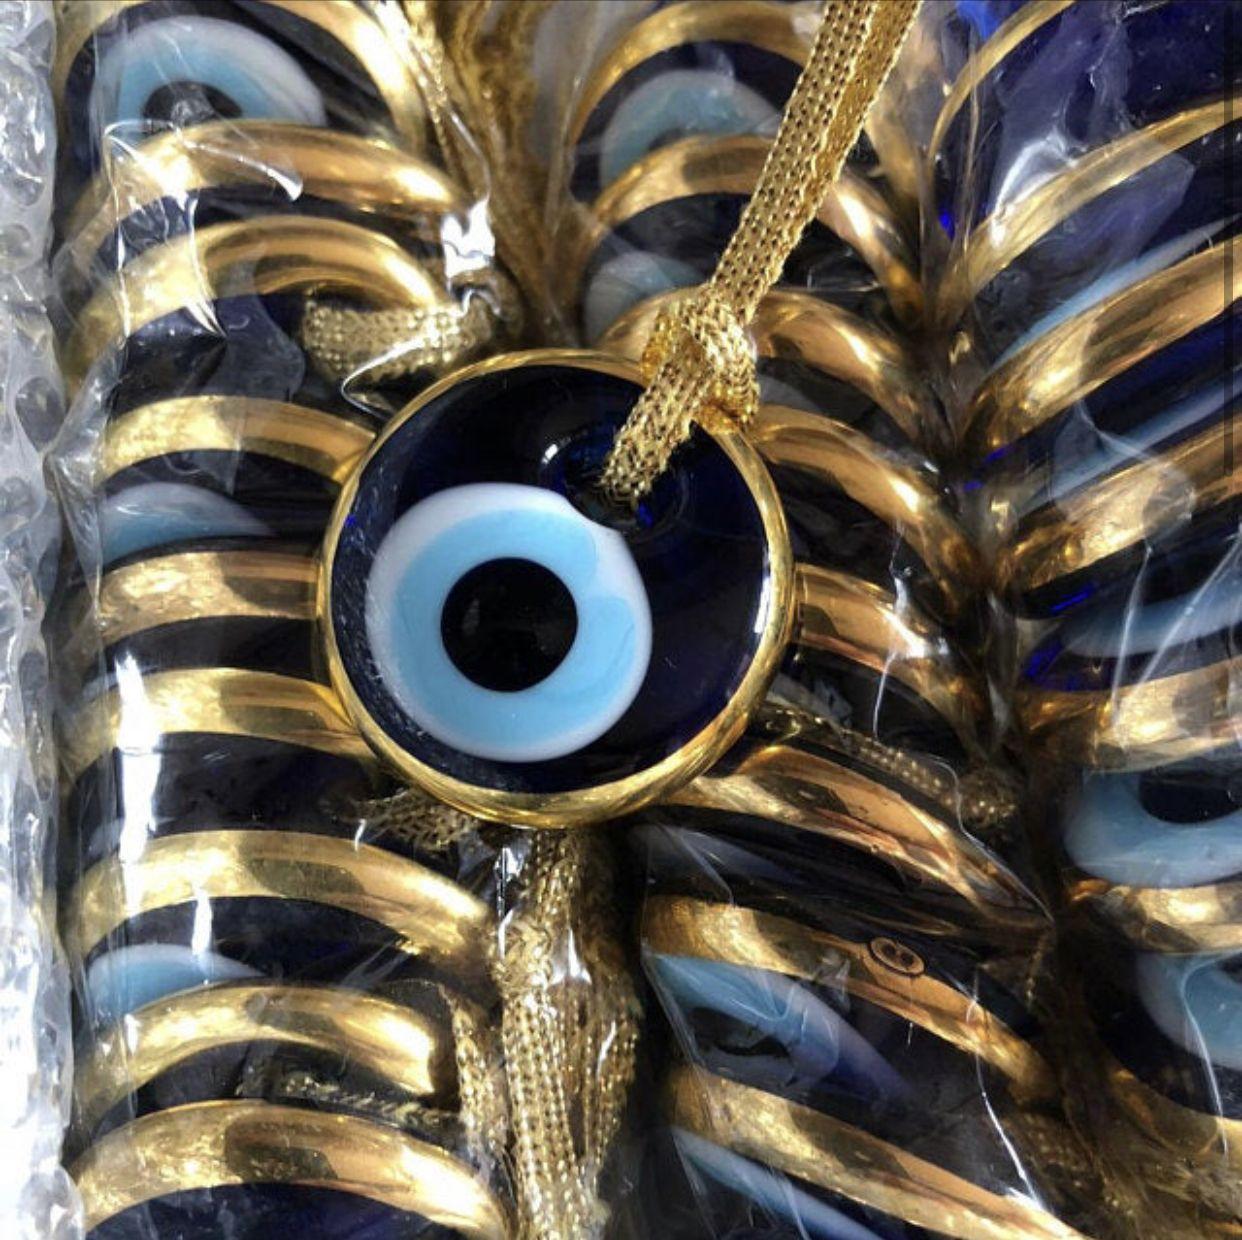 100 Pcs Wedding Favors For Guests Evil Eye Charm Gold Wedding Favors In 2020 Gold Wedding Favors Wedding Favors For Guests Wedding Favors